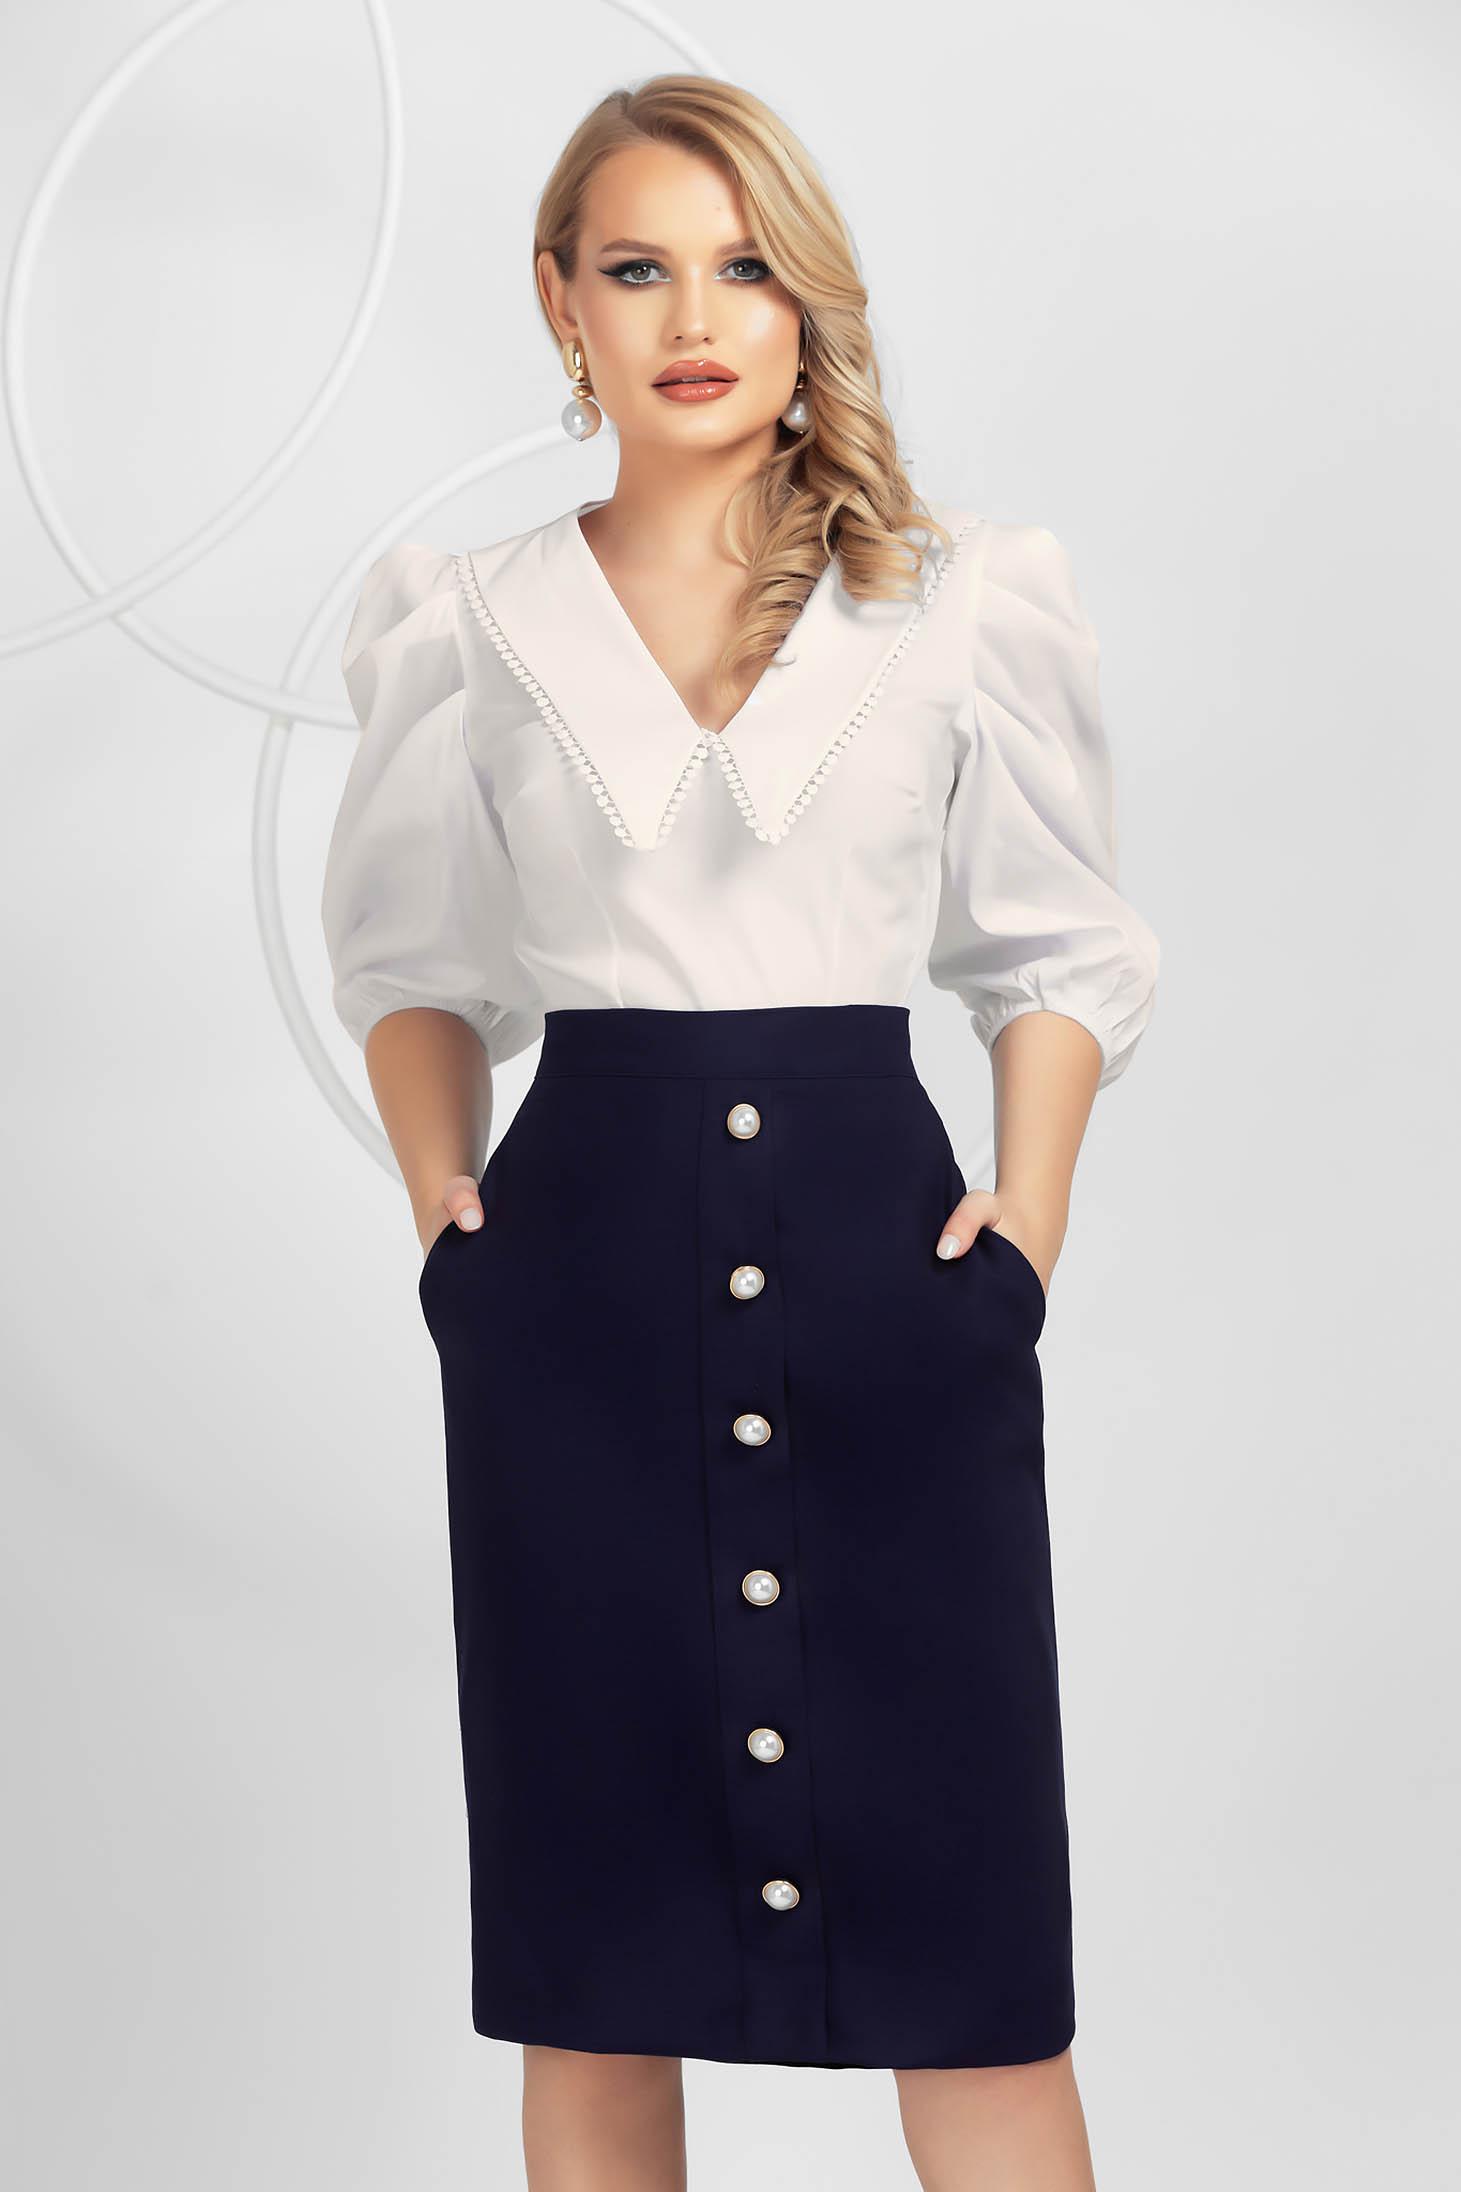 Darkblue skirt slightly elastic cotton elegant pencil with button accessories